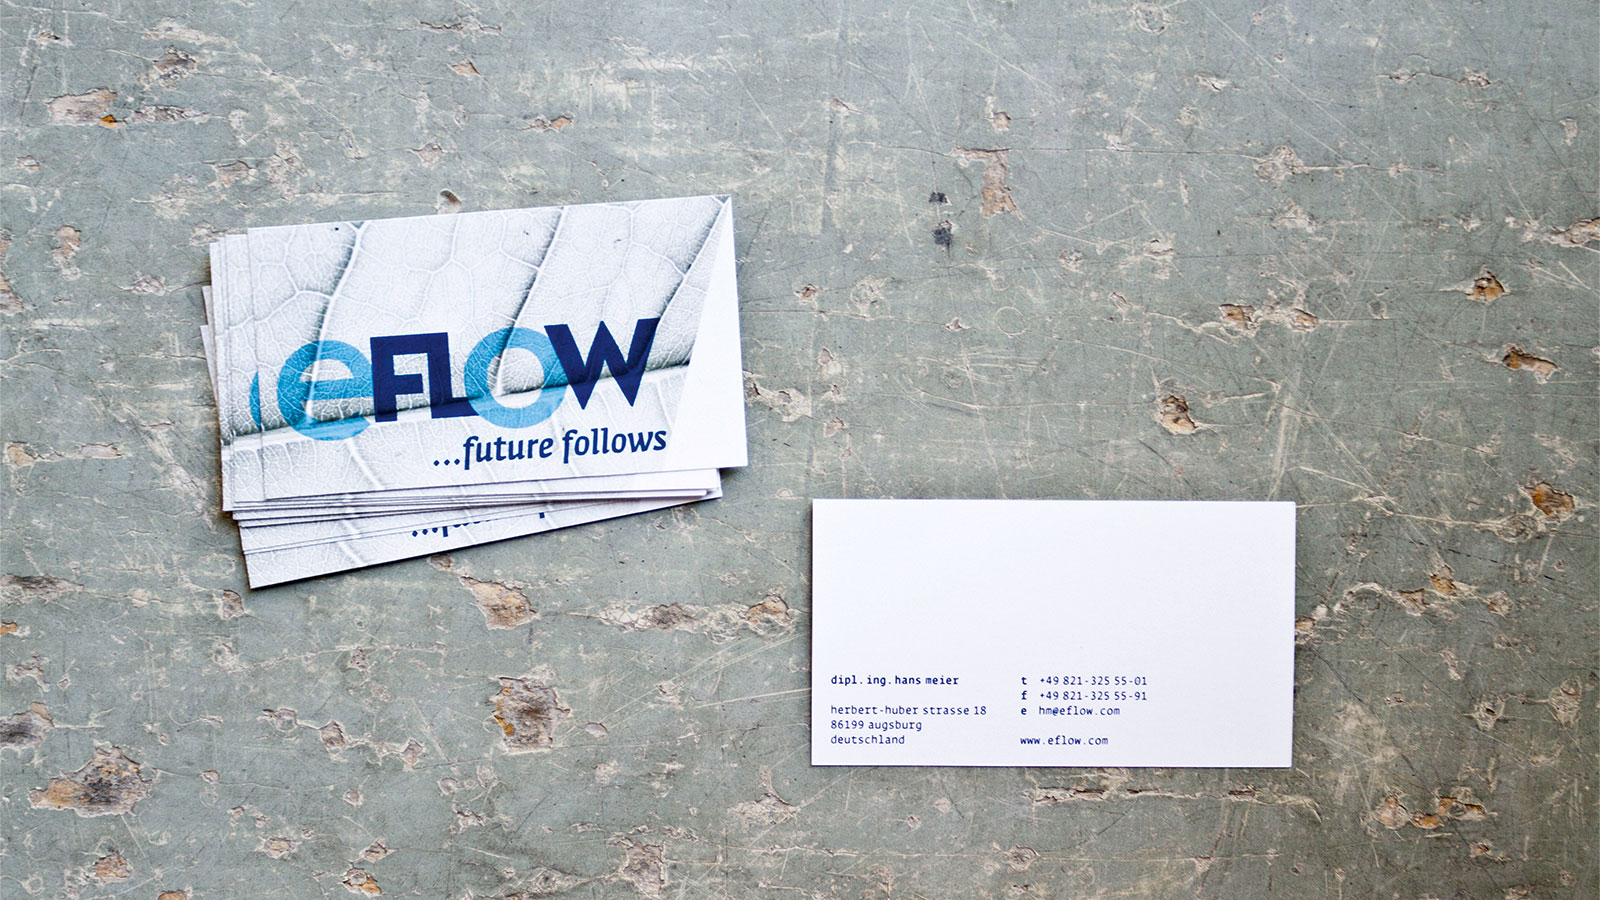 eflow-1600x900-2